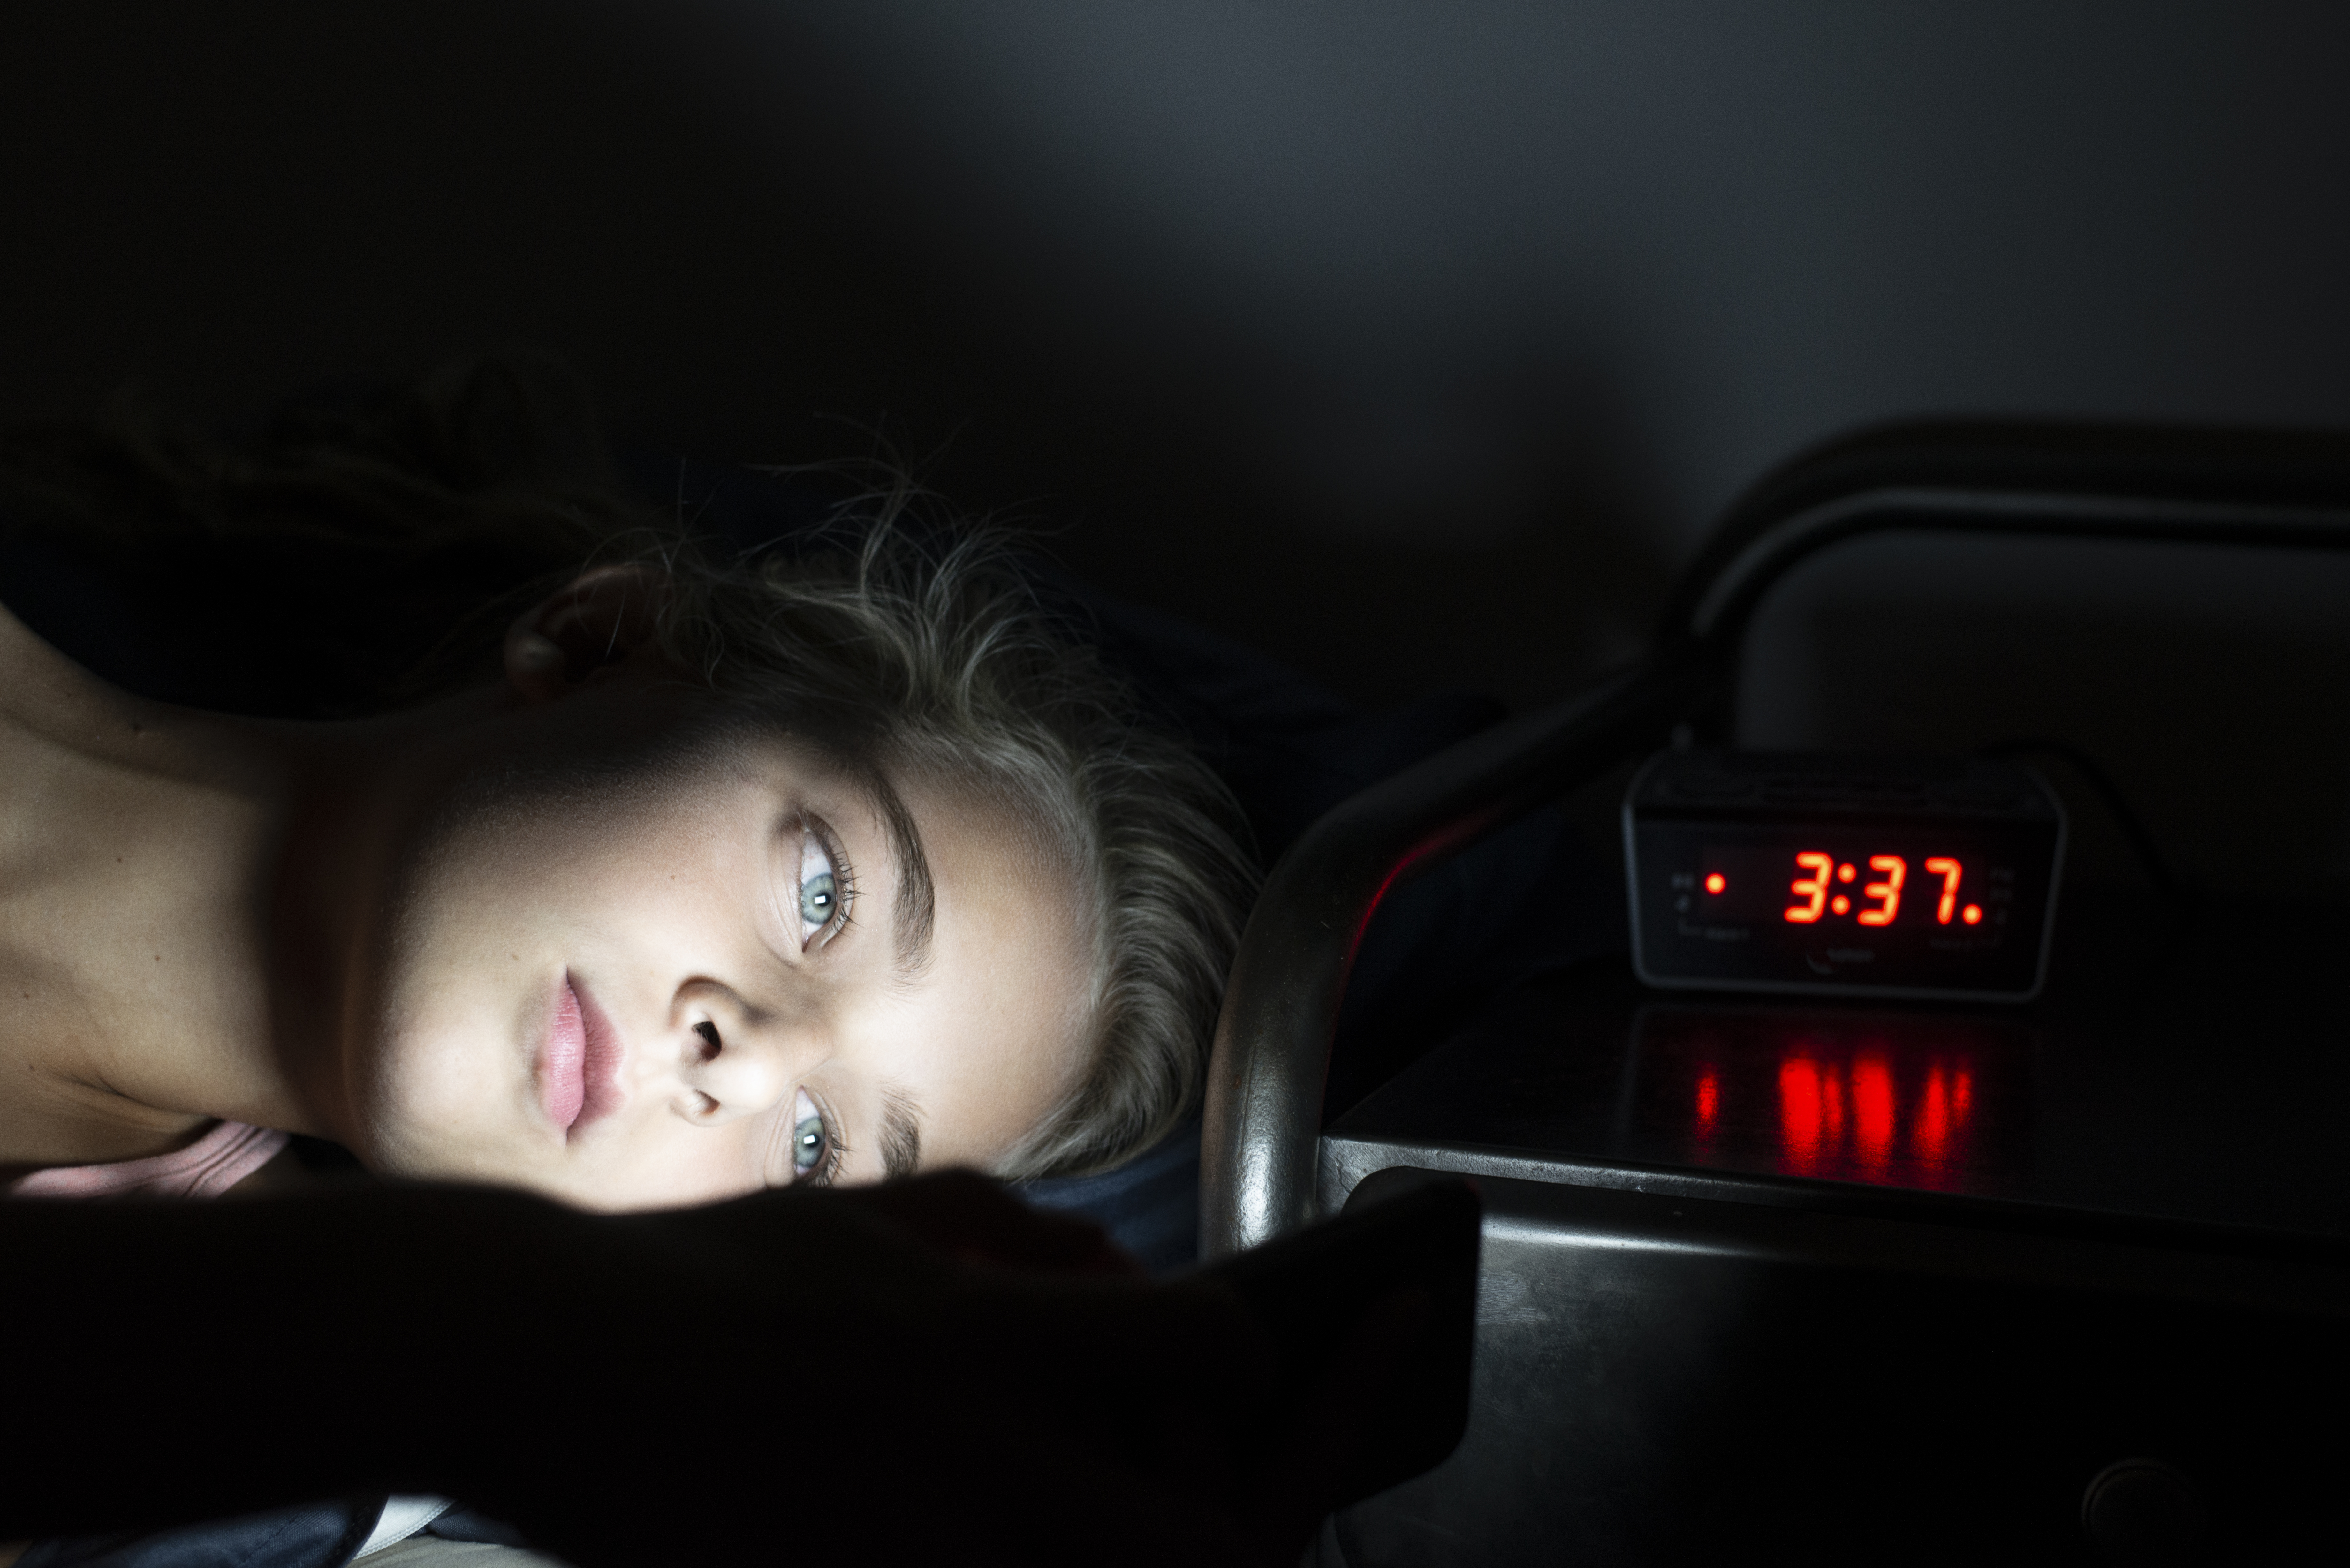 Problems Falling Asleep? Melatonin Can be a Natural Remedy